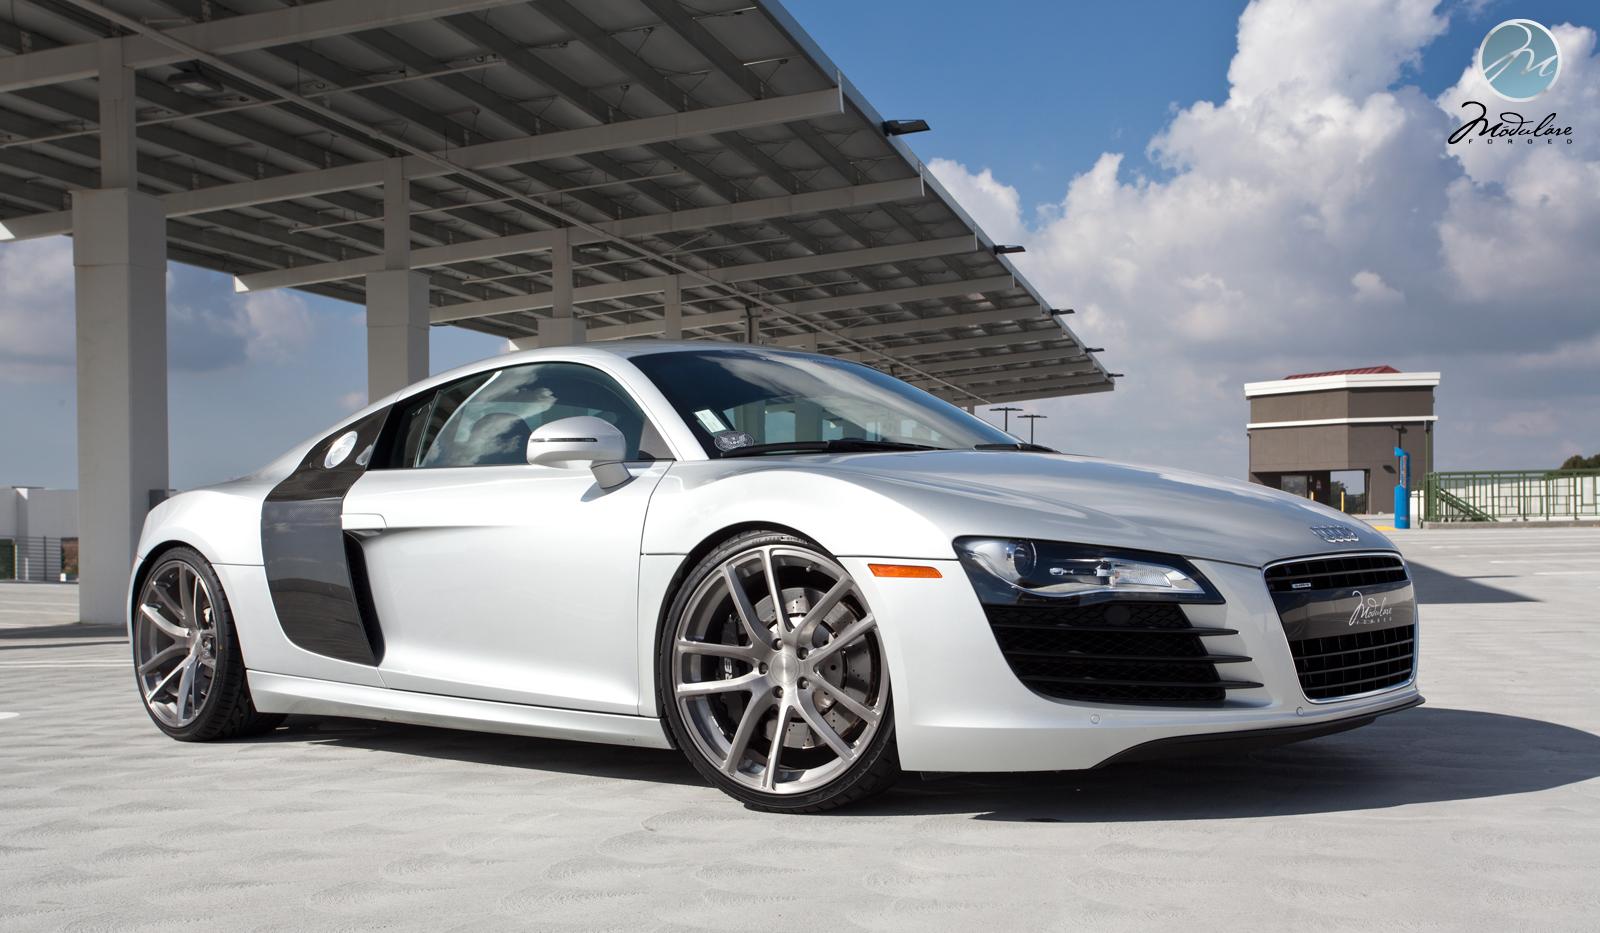 Audi R8 On Modulare Wheels Autoevolution